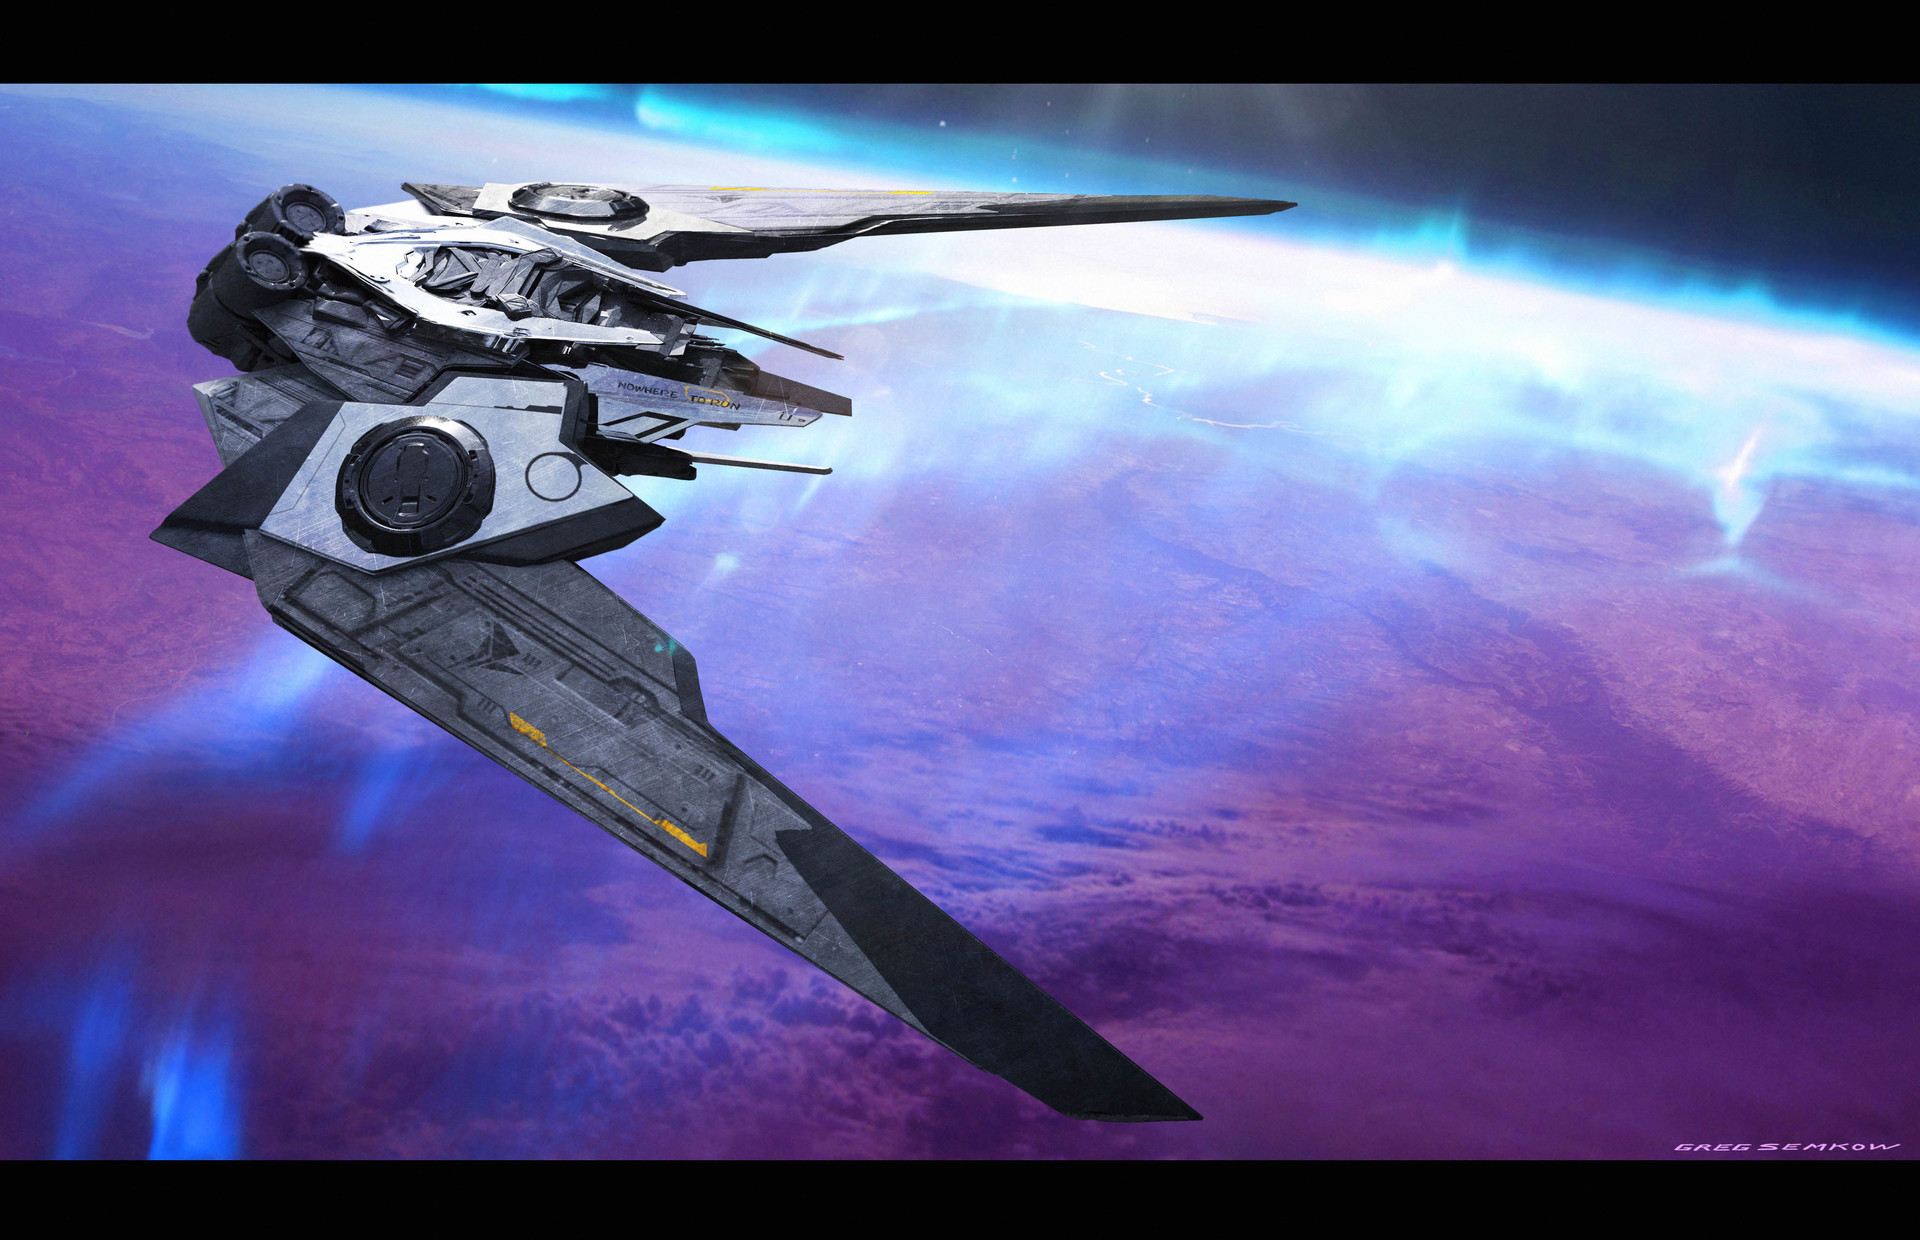 Orbital Drone